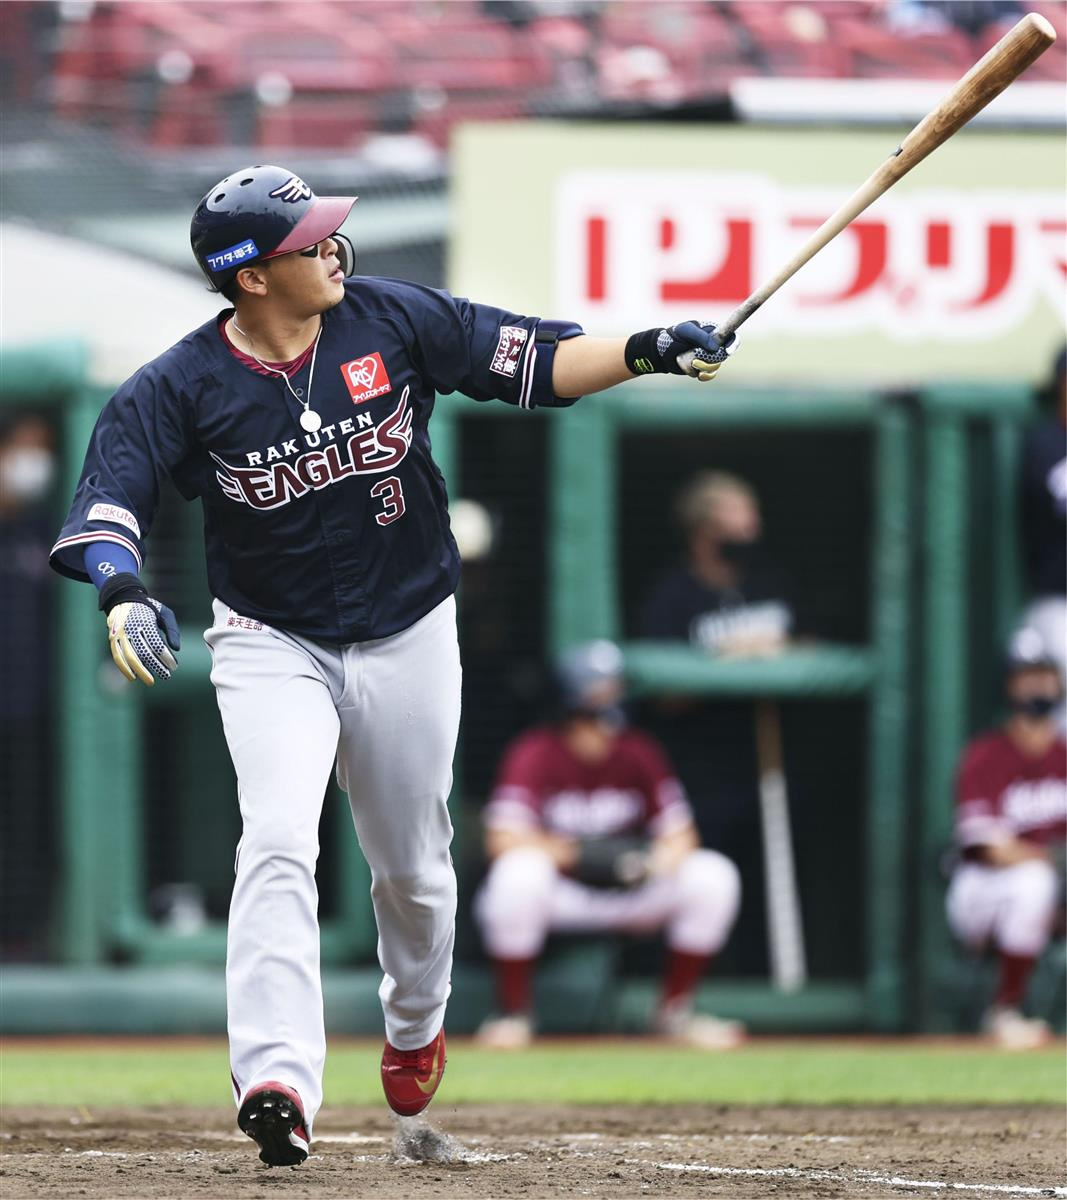 楽12-4ロ 浅村が3本塁打、楽天3連勝